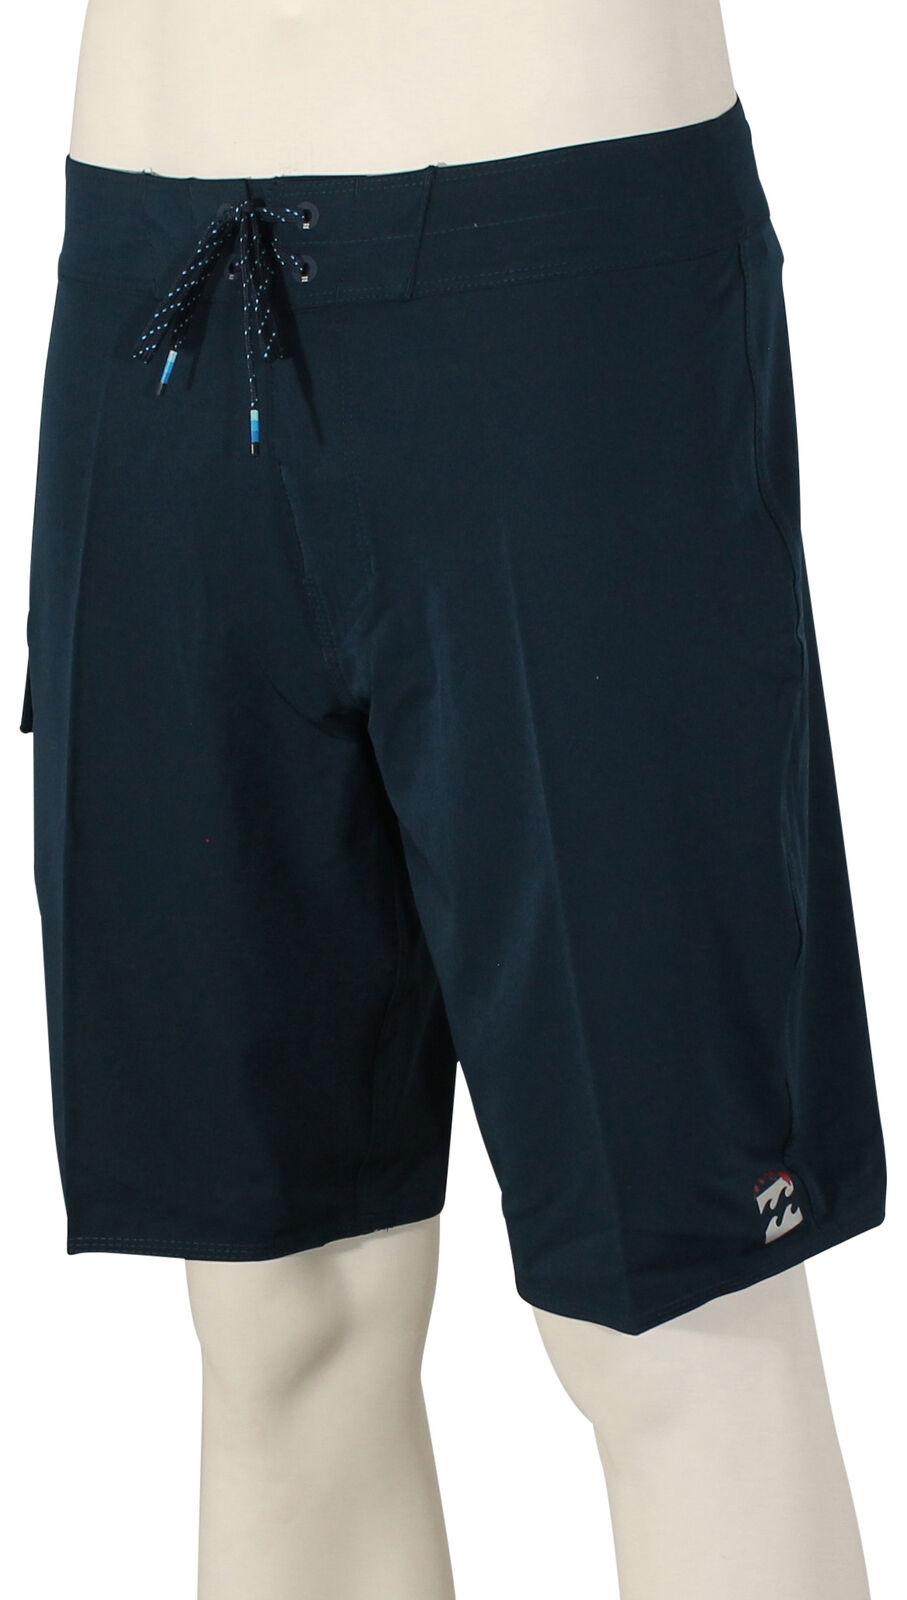 Billabong All Day X Hawaii Boardshorts - Navy - New